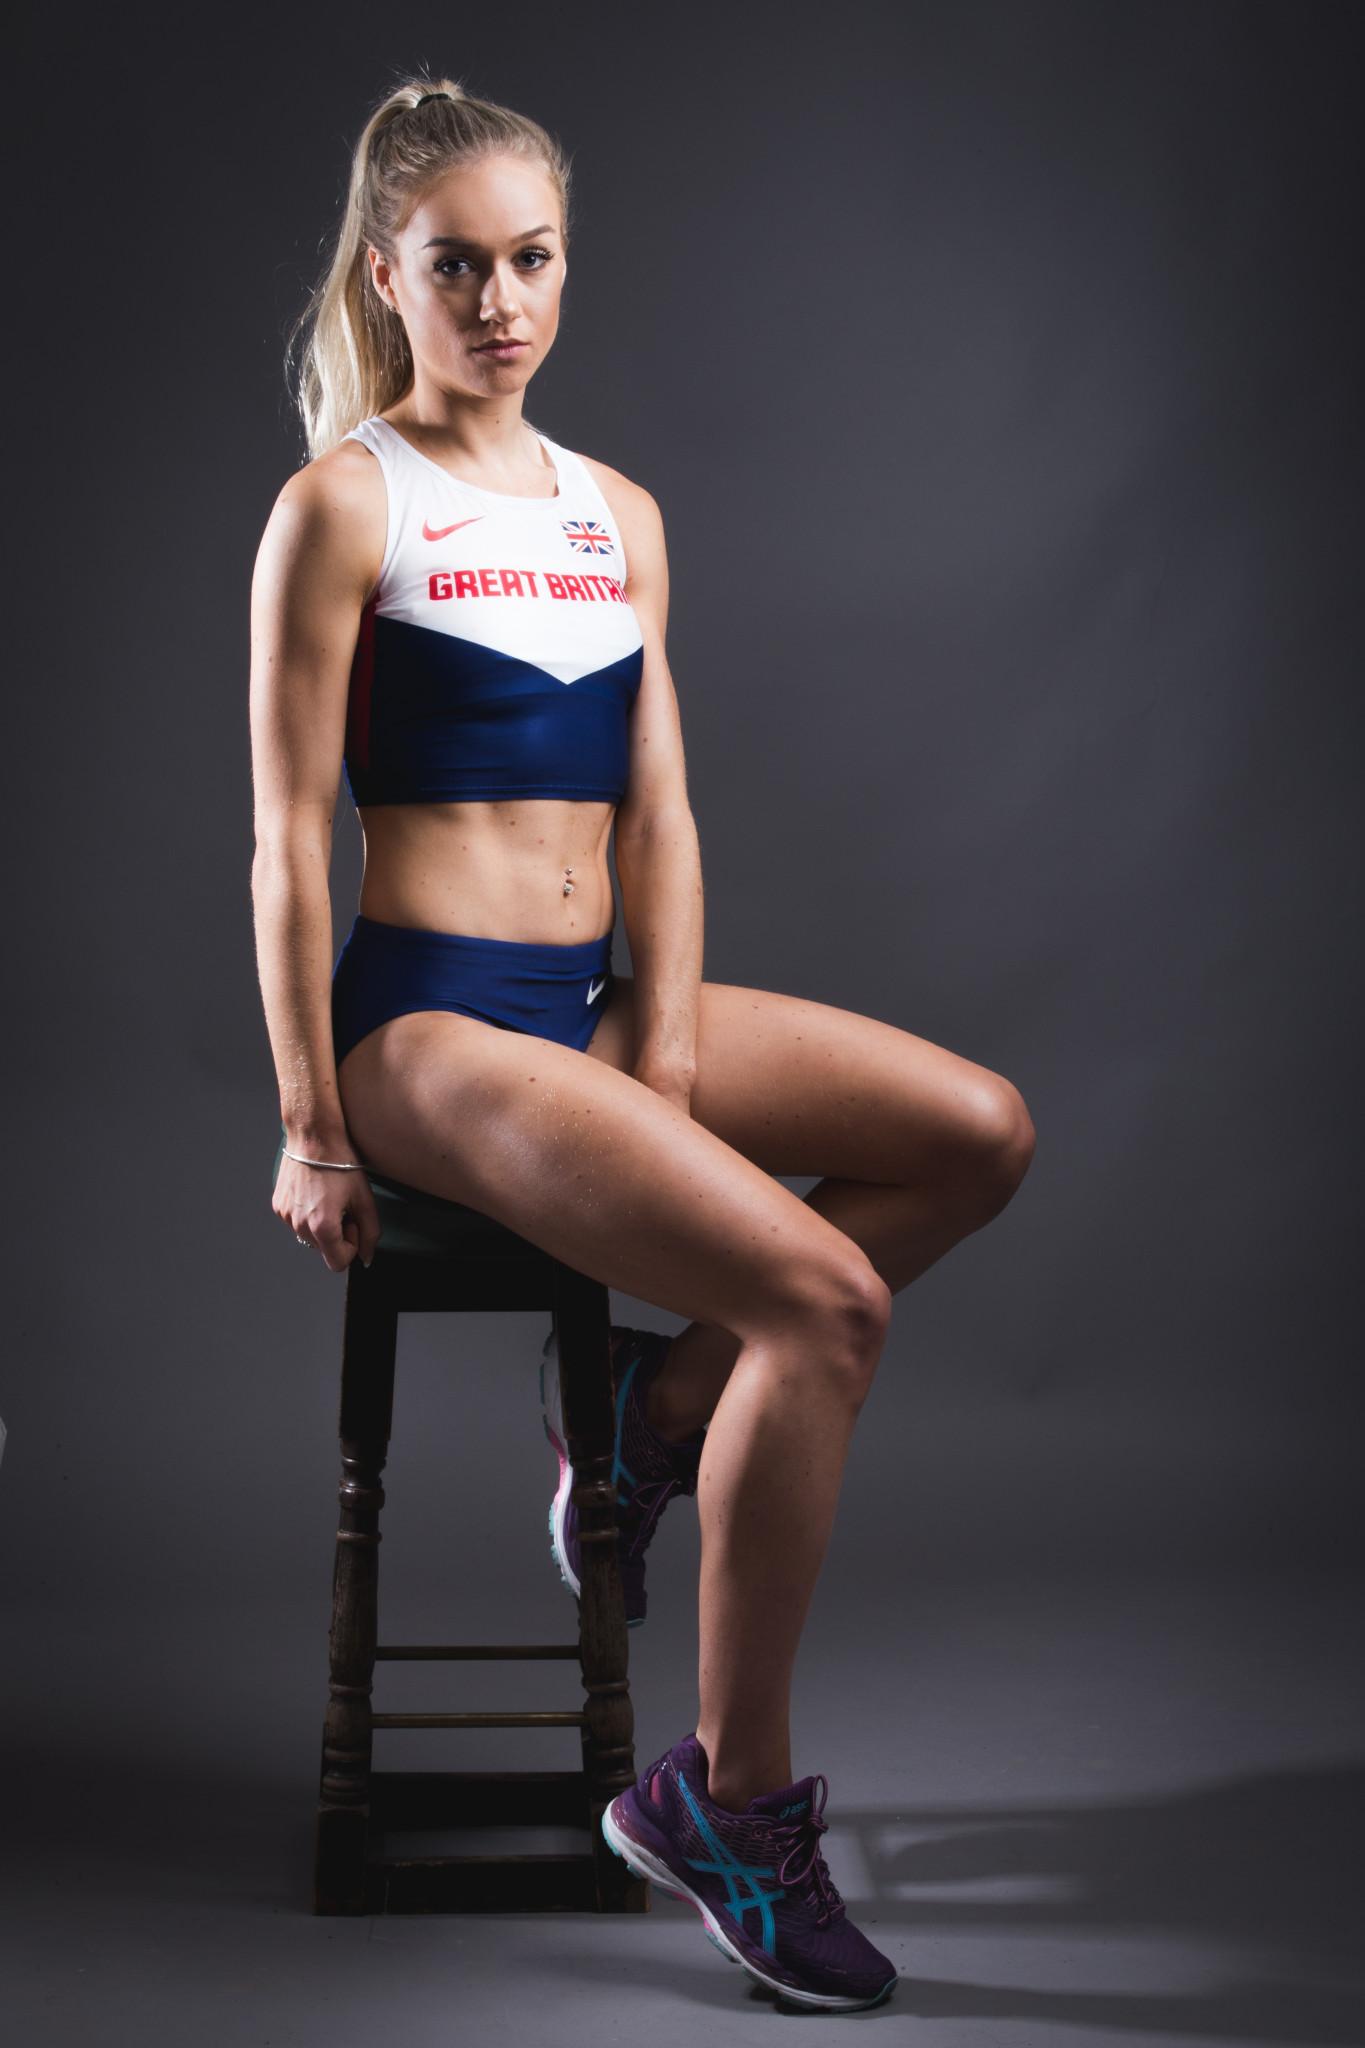 Hannah Nuttall photoshoot, uk - 2 November 2016